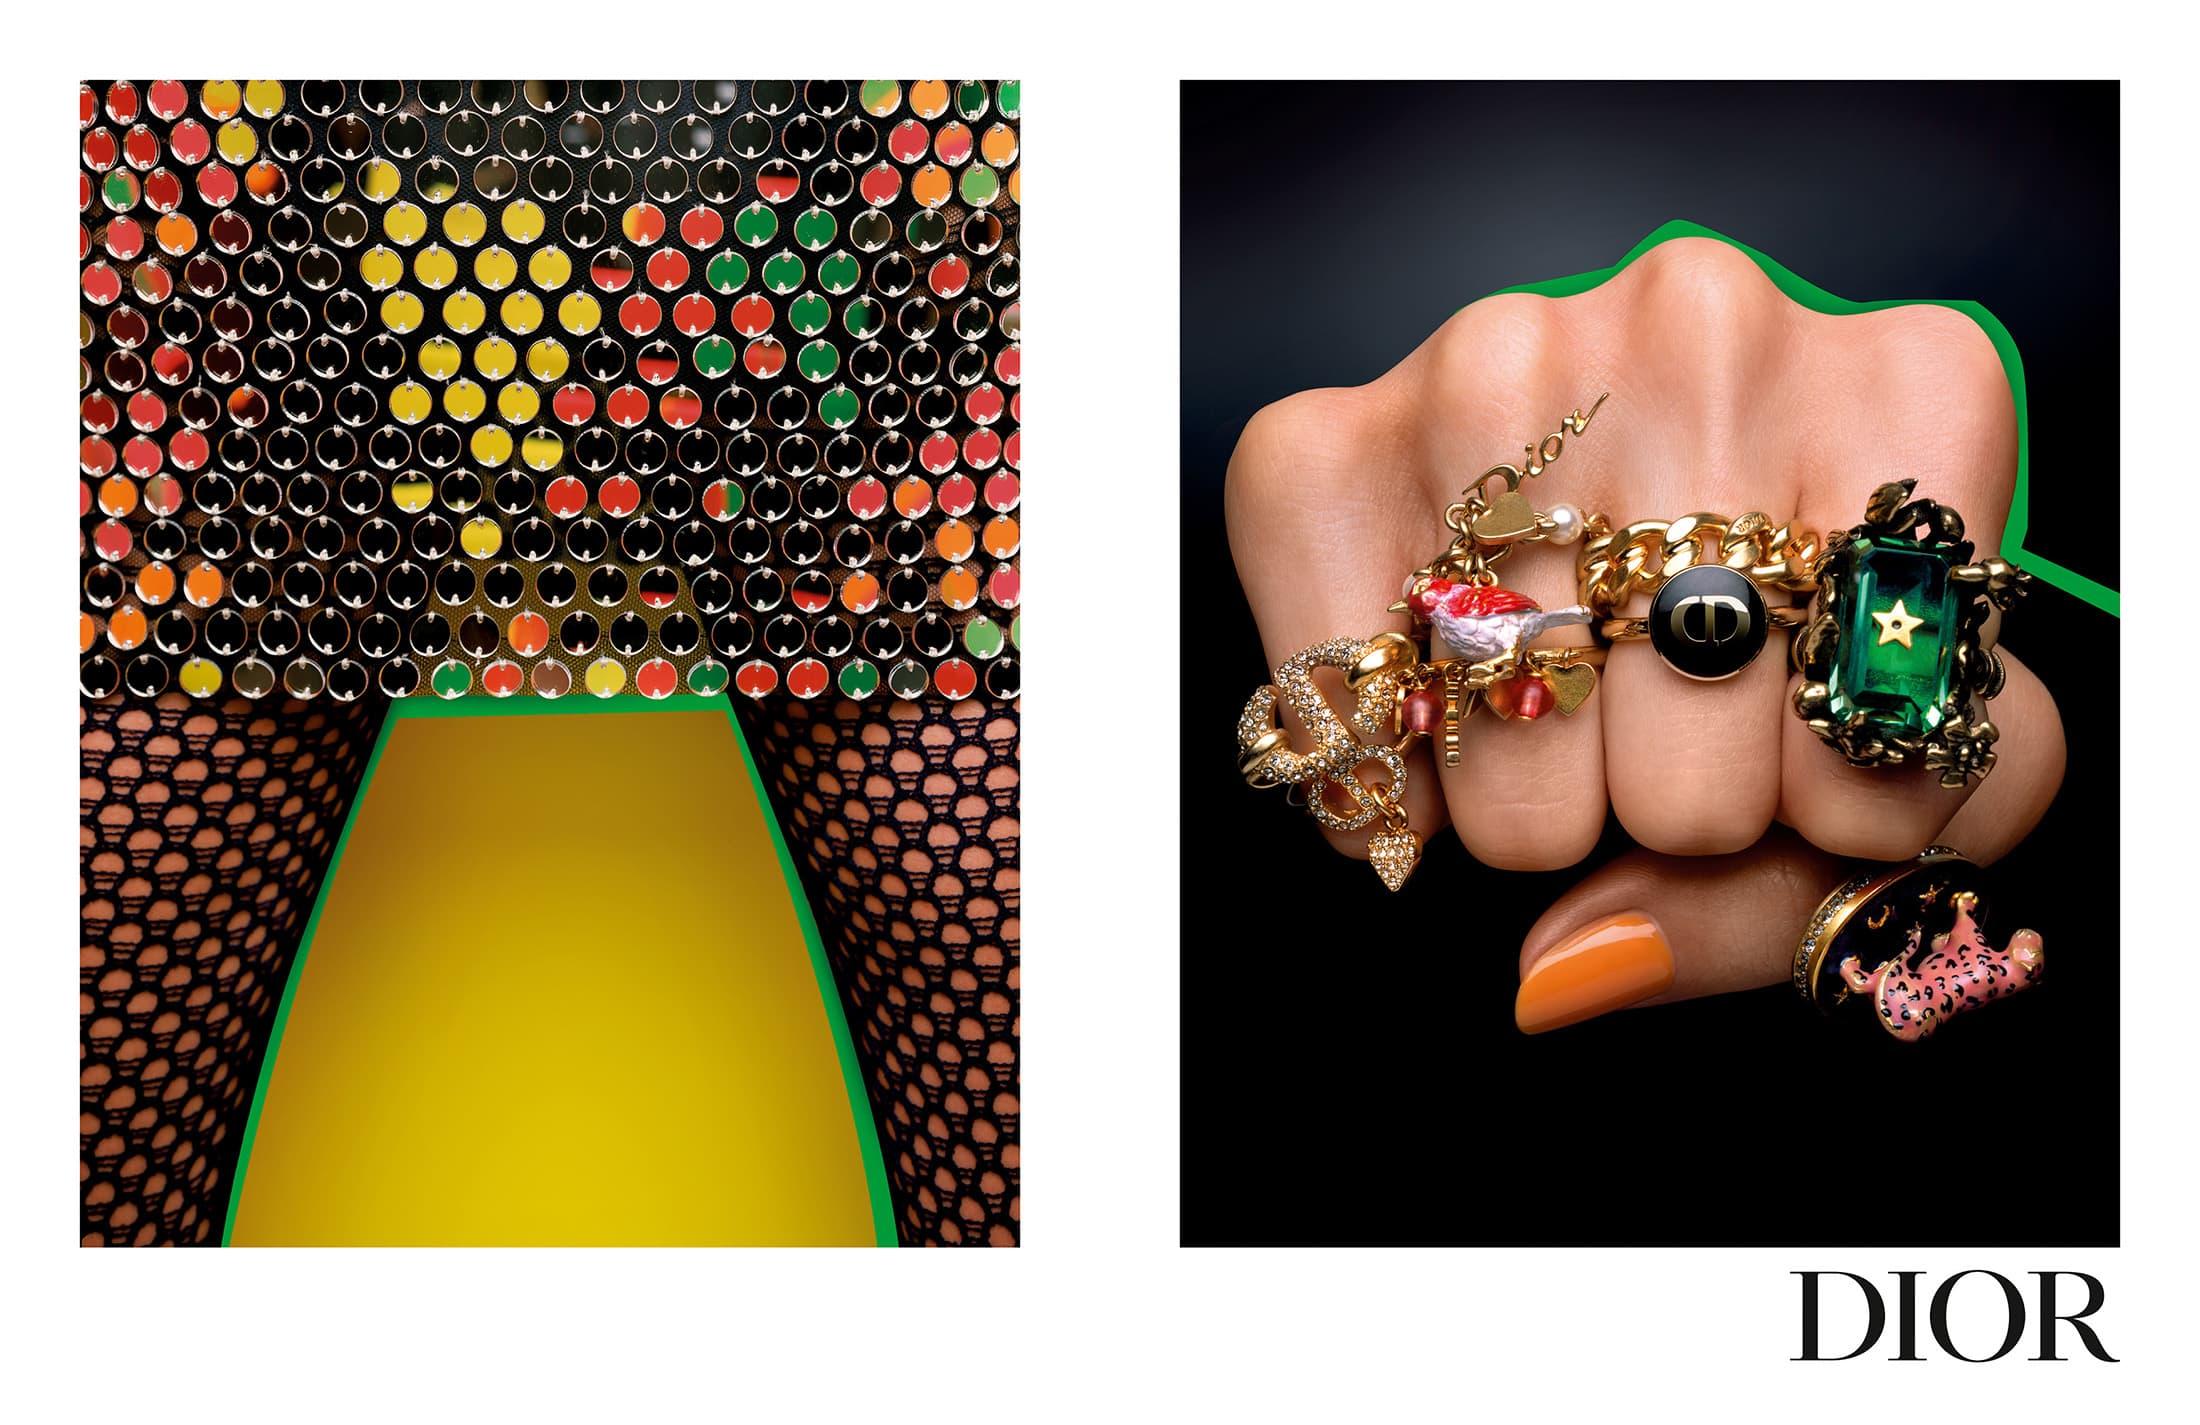 Dior Fall 2021 Ad Campaign Photos